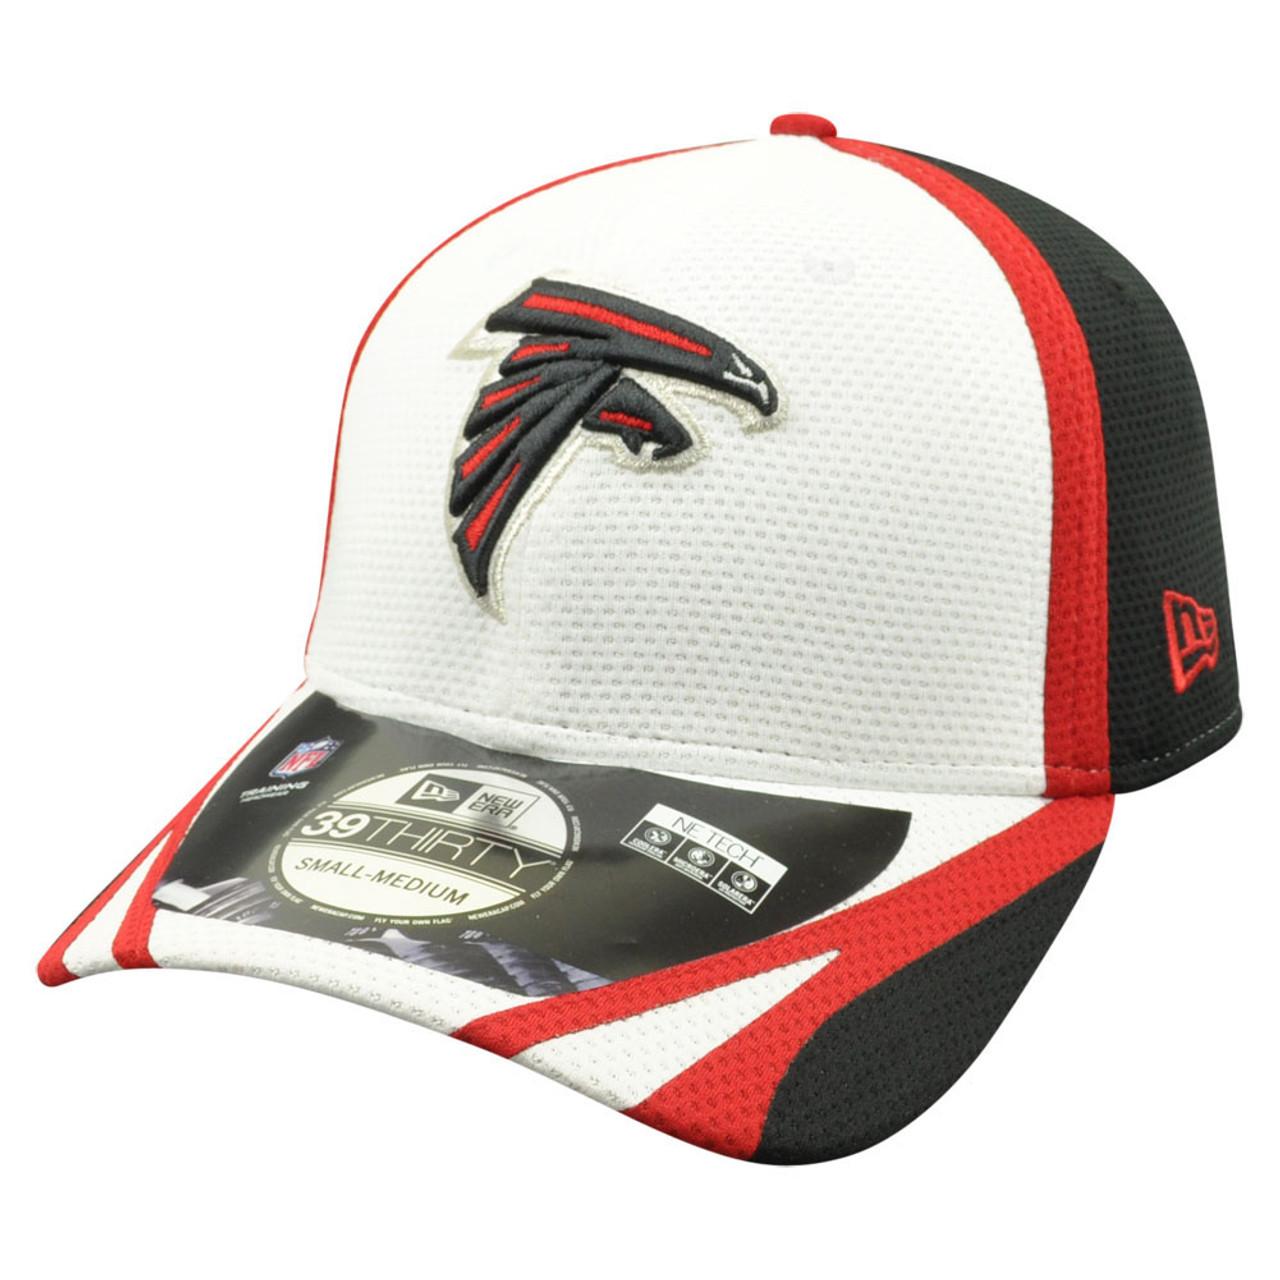 sneakers for cheap 21e6a ba196 NFL New Era 39Thirty Atlanta Falcons 2014 Official Field Training Flex Fit  S M - Cap Store Online.com